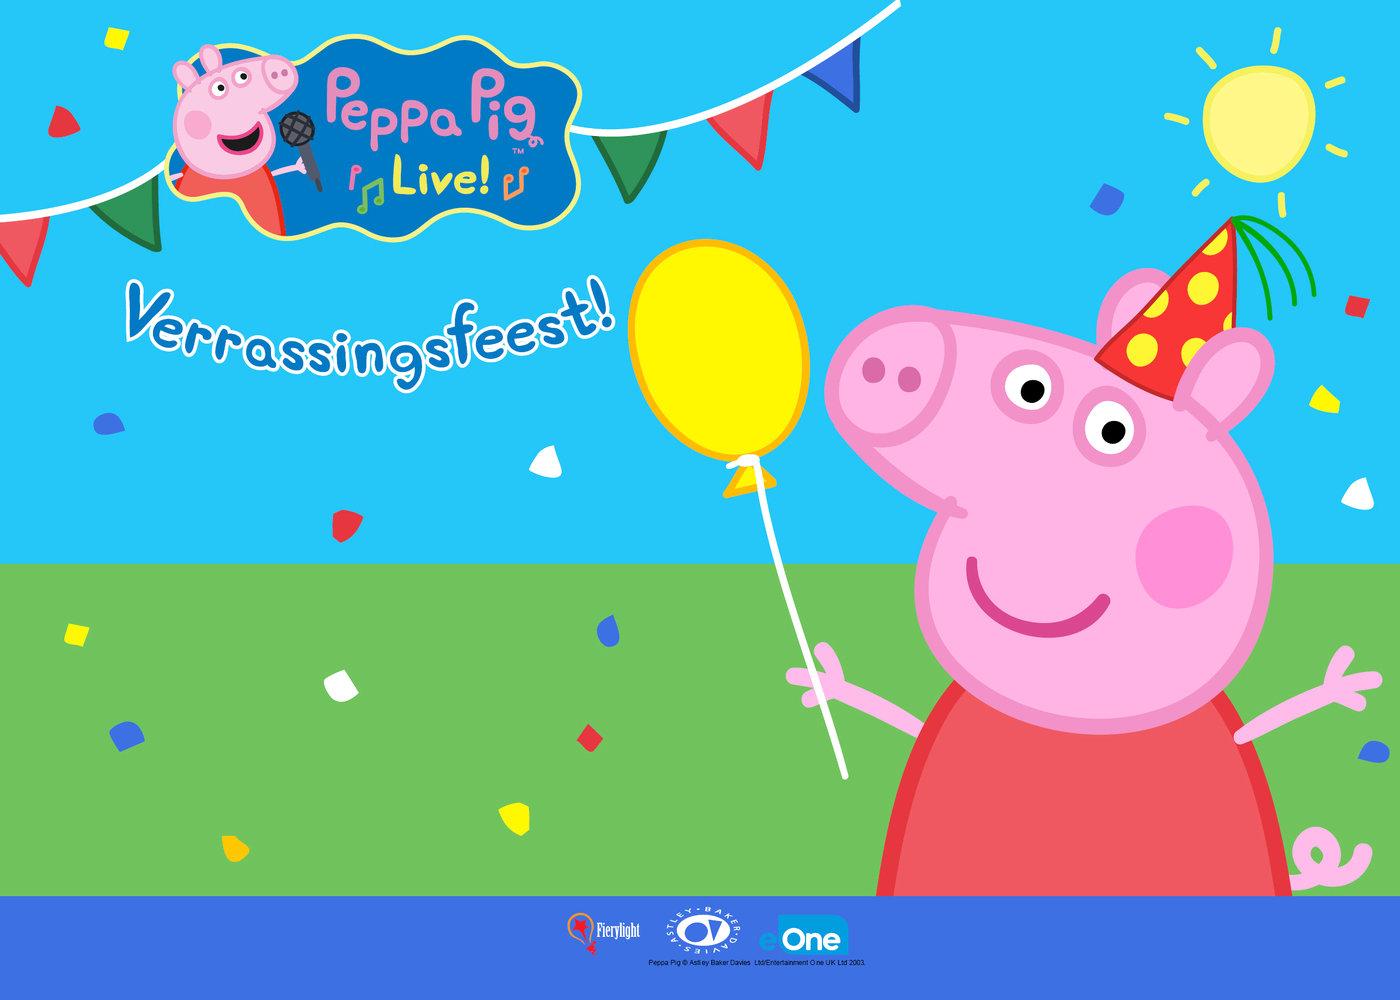 Nickalive Peppa Pig Live Verrassingsfeest To Tour The